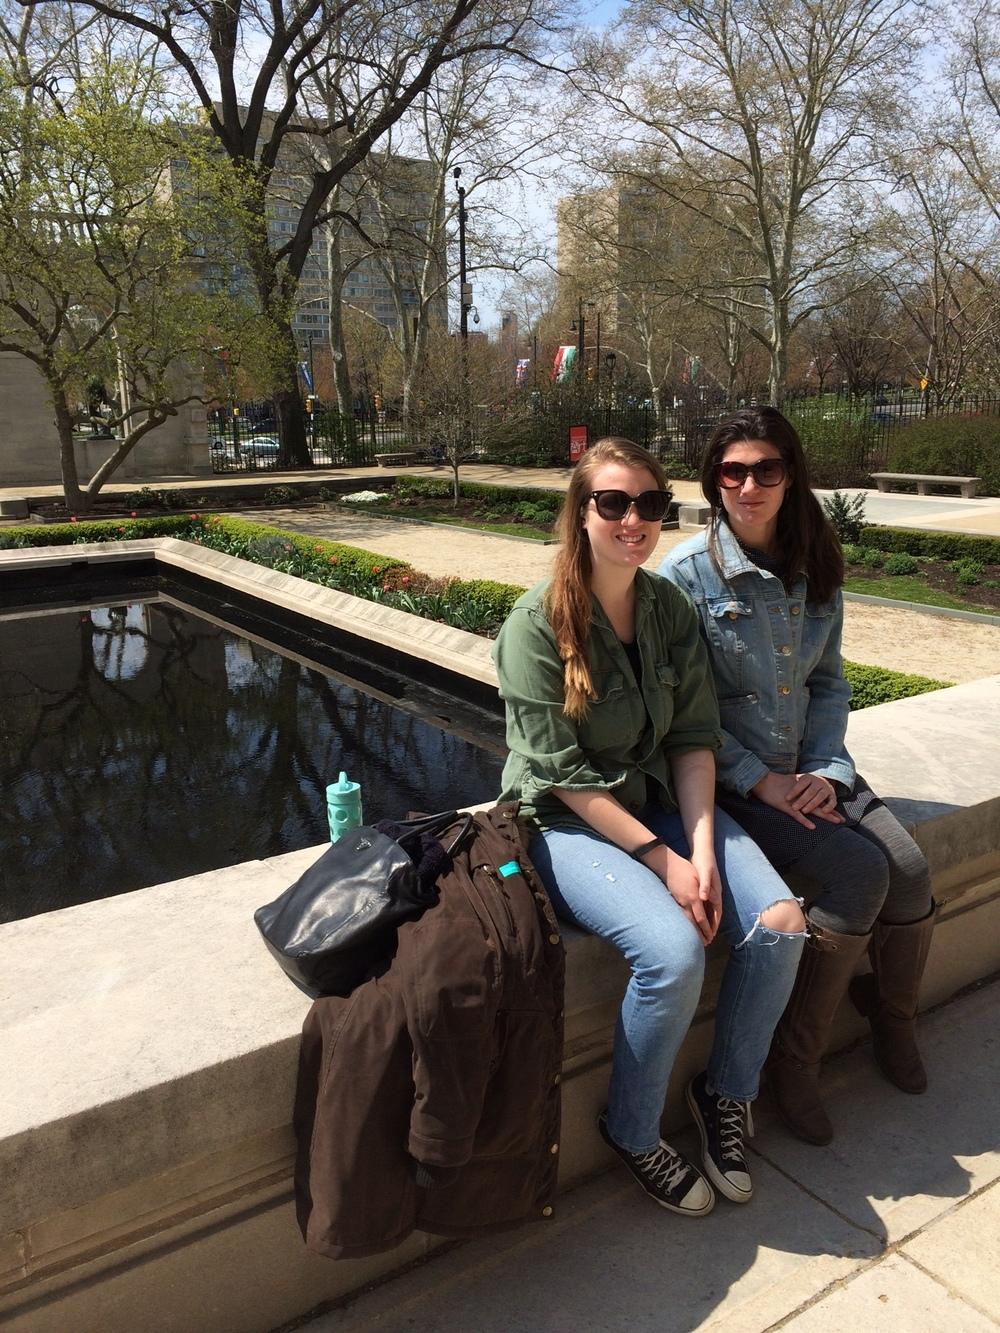 Sisters in Rodin's garden...